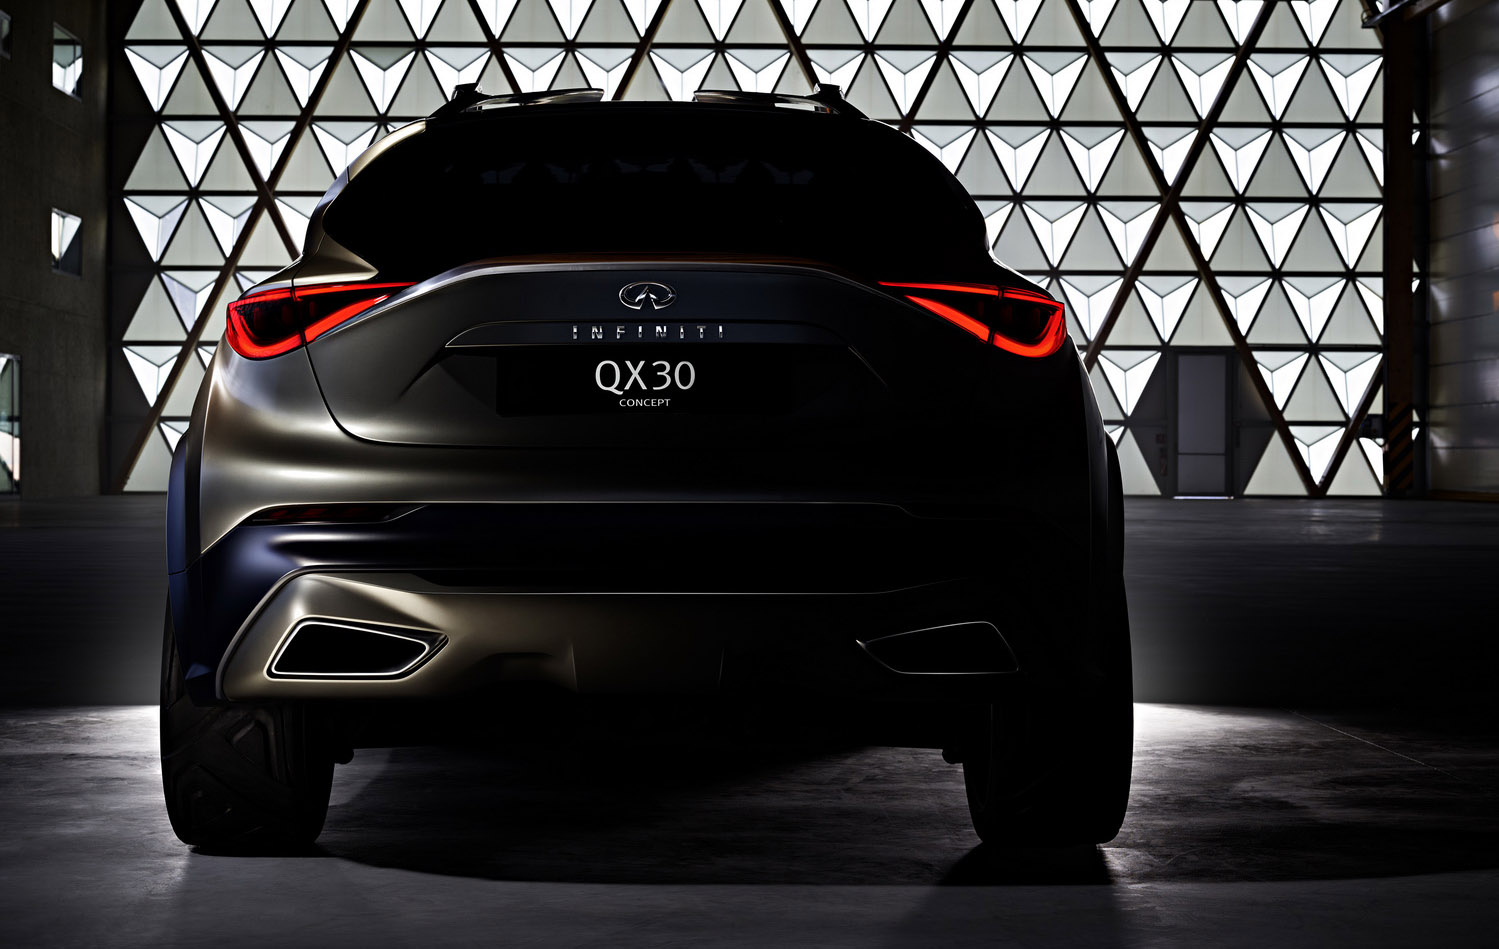 Infiniti QX30 Compact SUV Teased